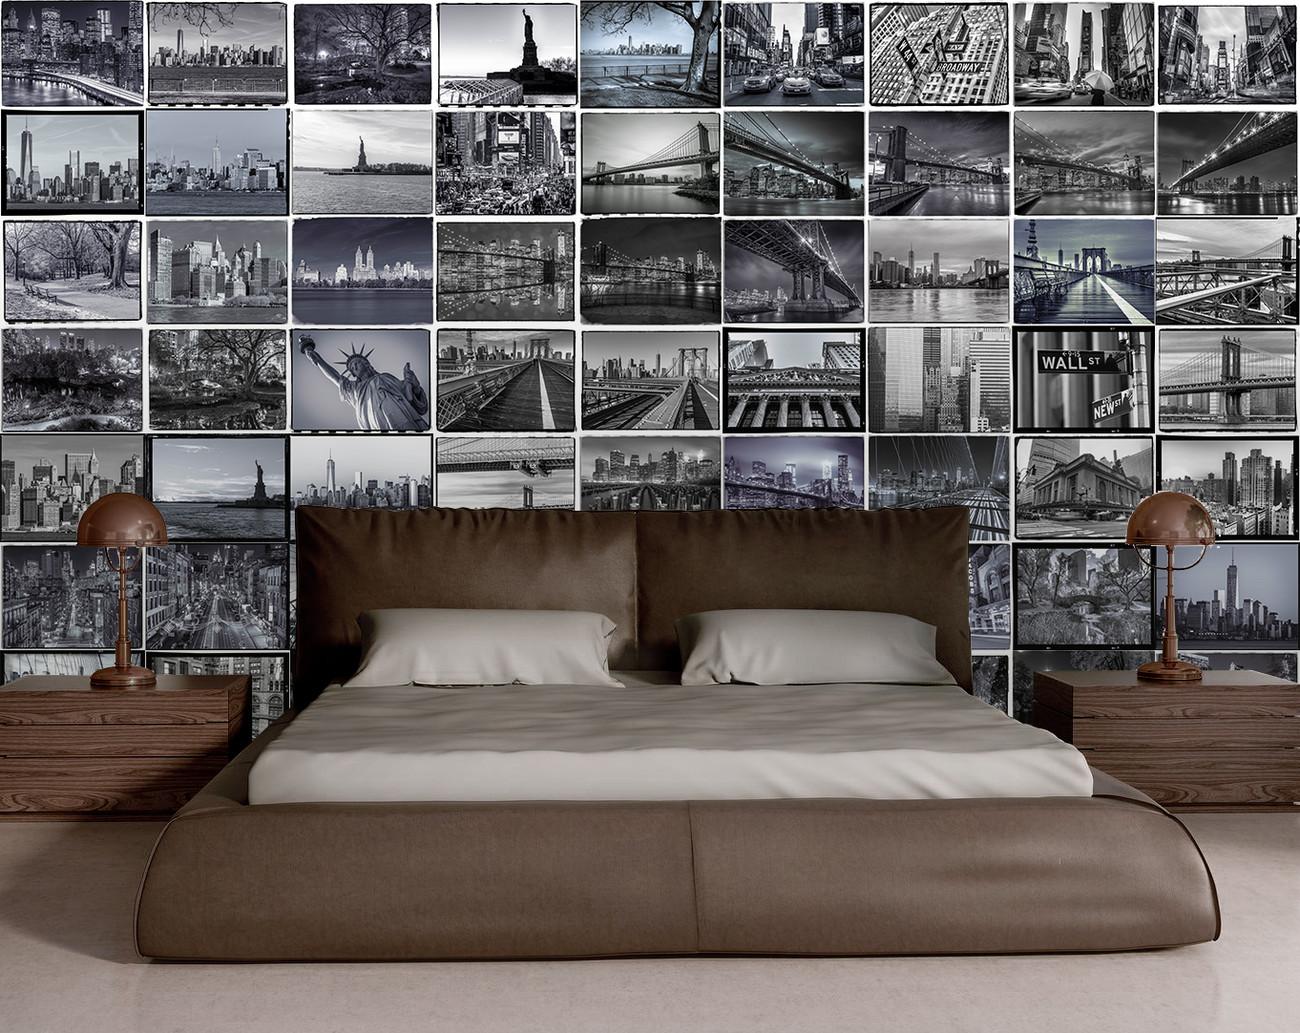 fototapete tapete new york bei europosters kostenloser versand. Black Bedroom Furniture Sets. Home Design Ideas